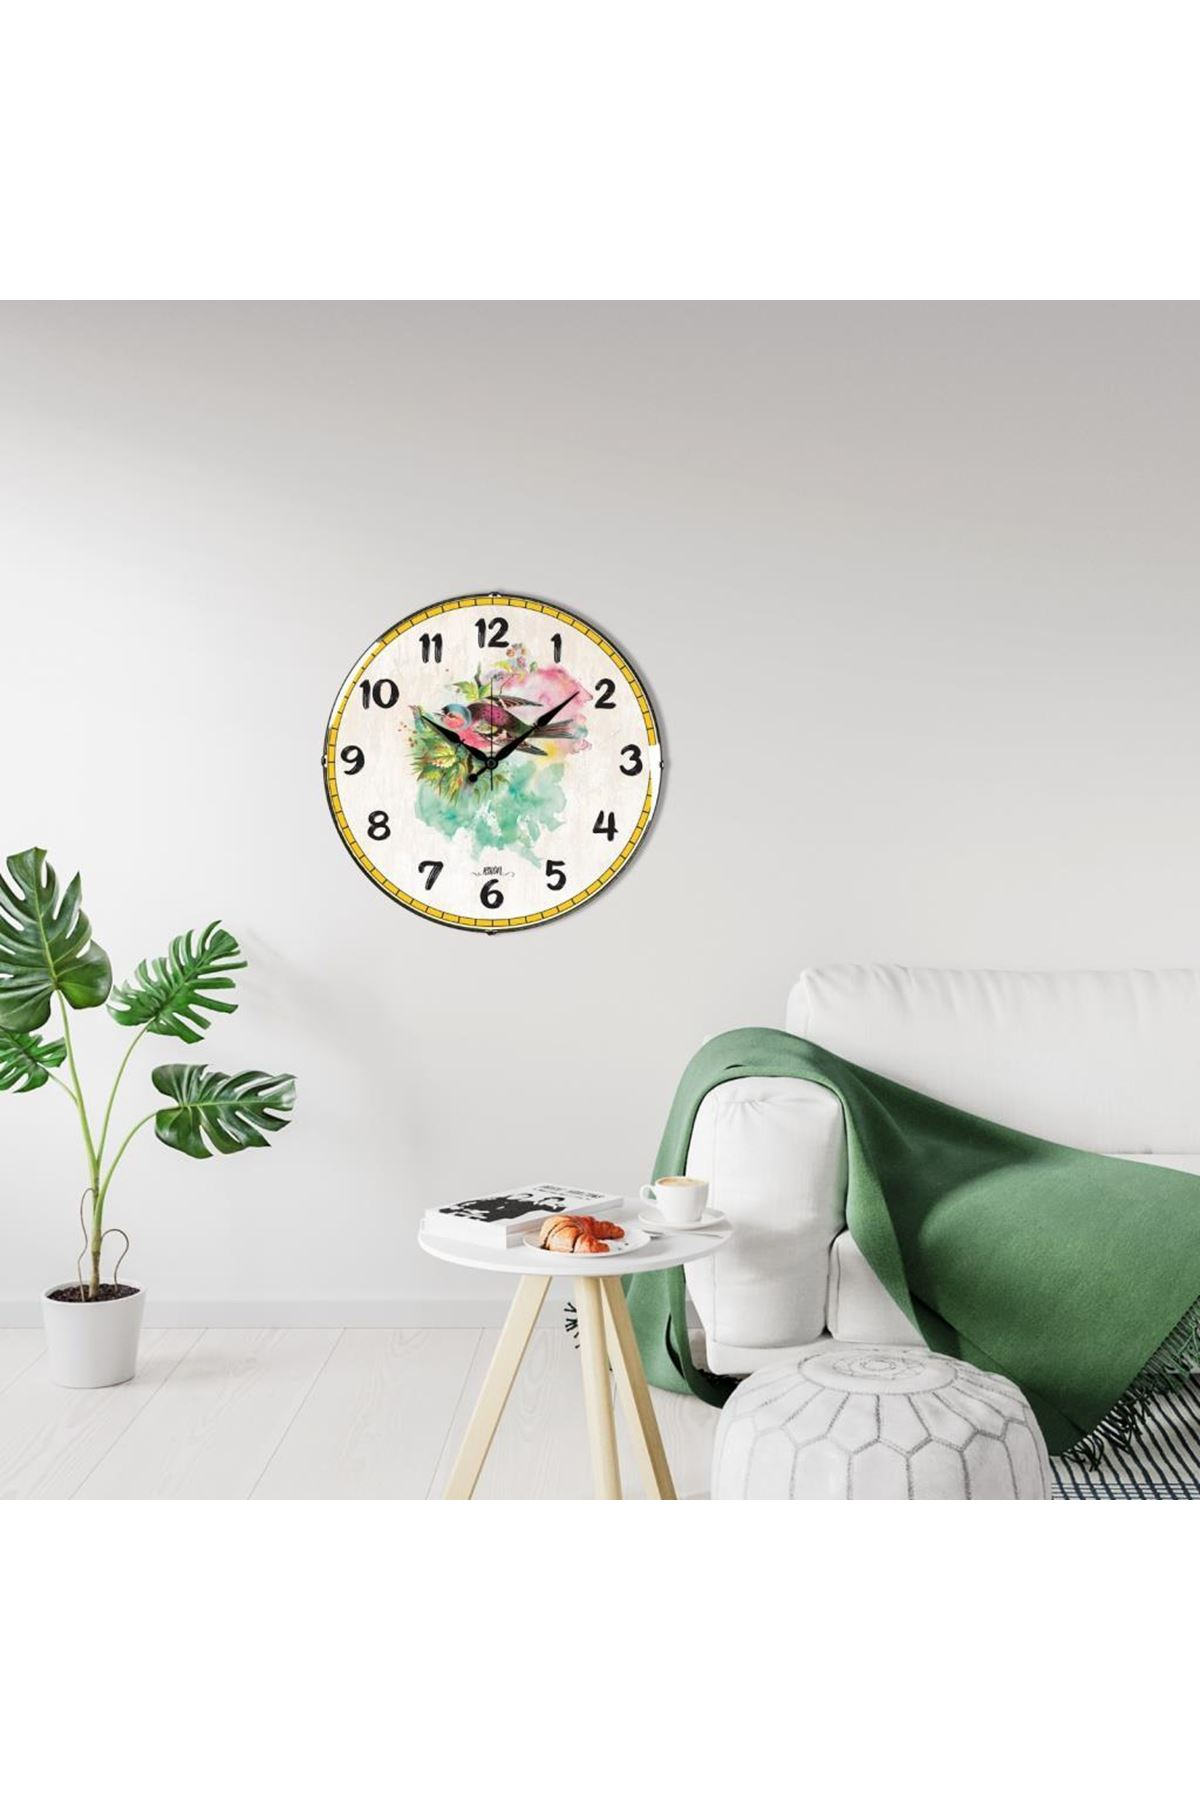 Rikon Rengarenk Kuş Dekoratif Bombe Camlı Duvar Saati